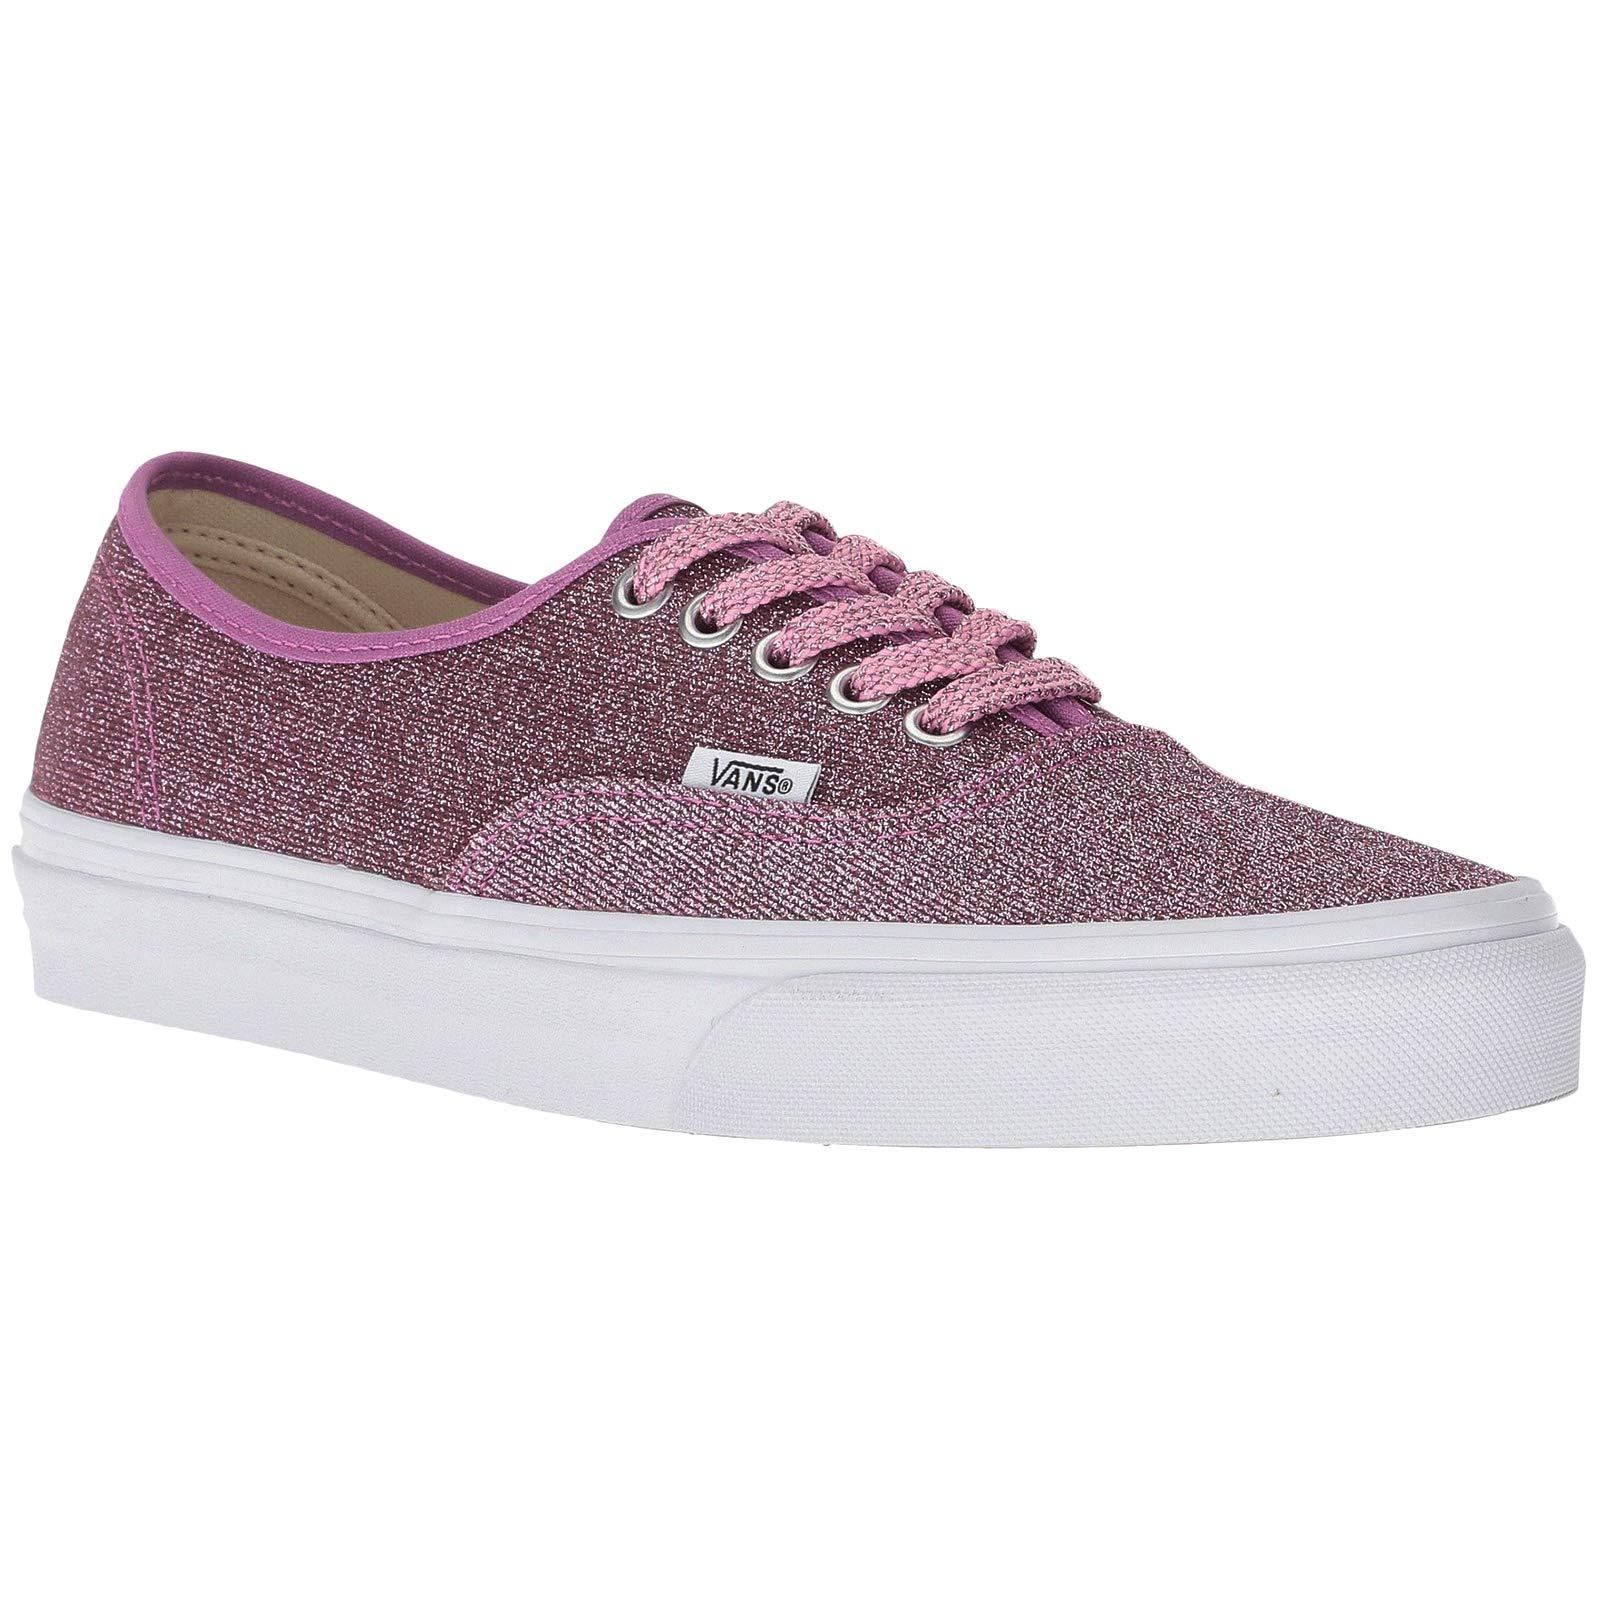 Vans Unisex Authentic Lurex Glitter Textile Pink